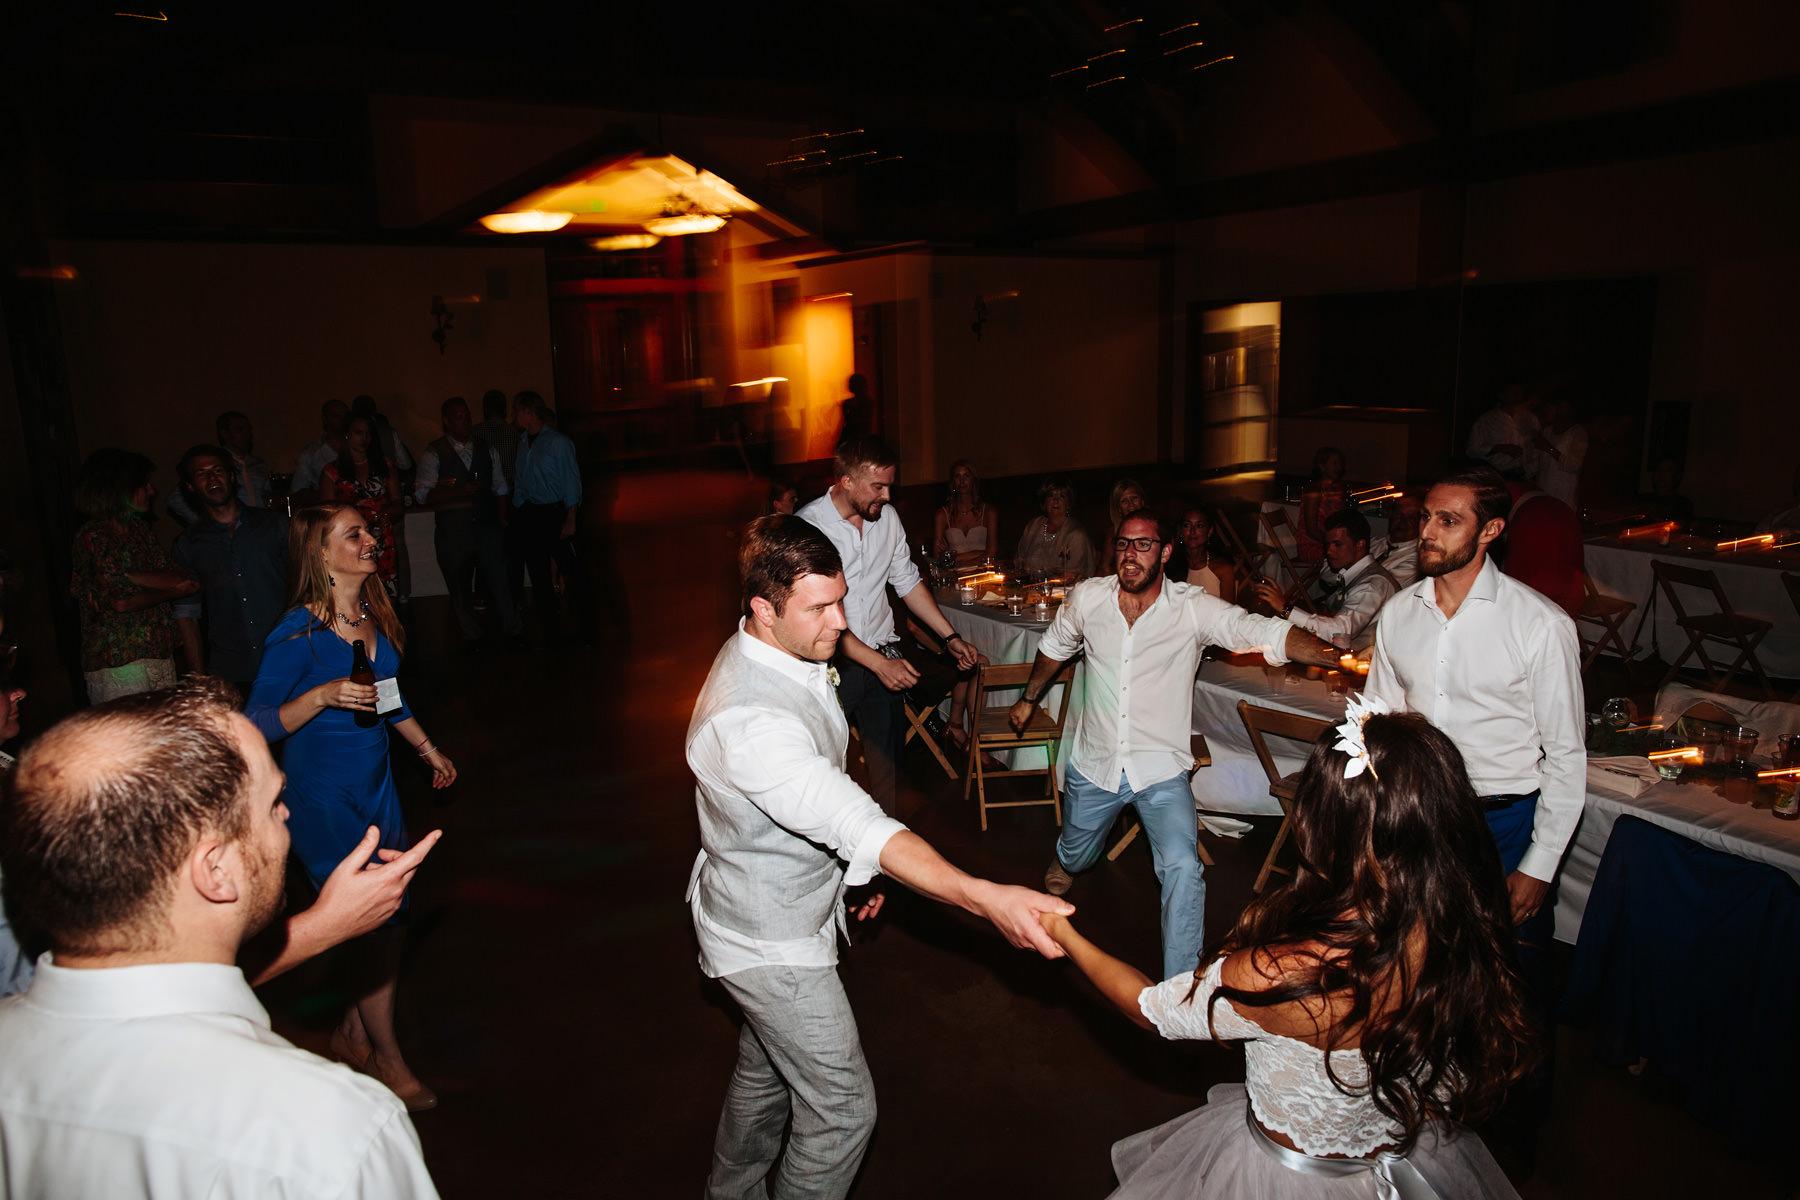 Vail Colorado Wedding Deck_ Kindling Wedding Photography100.JPG